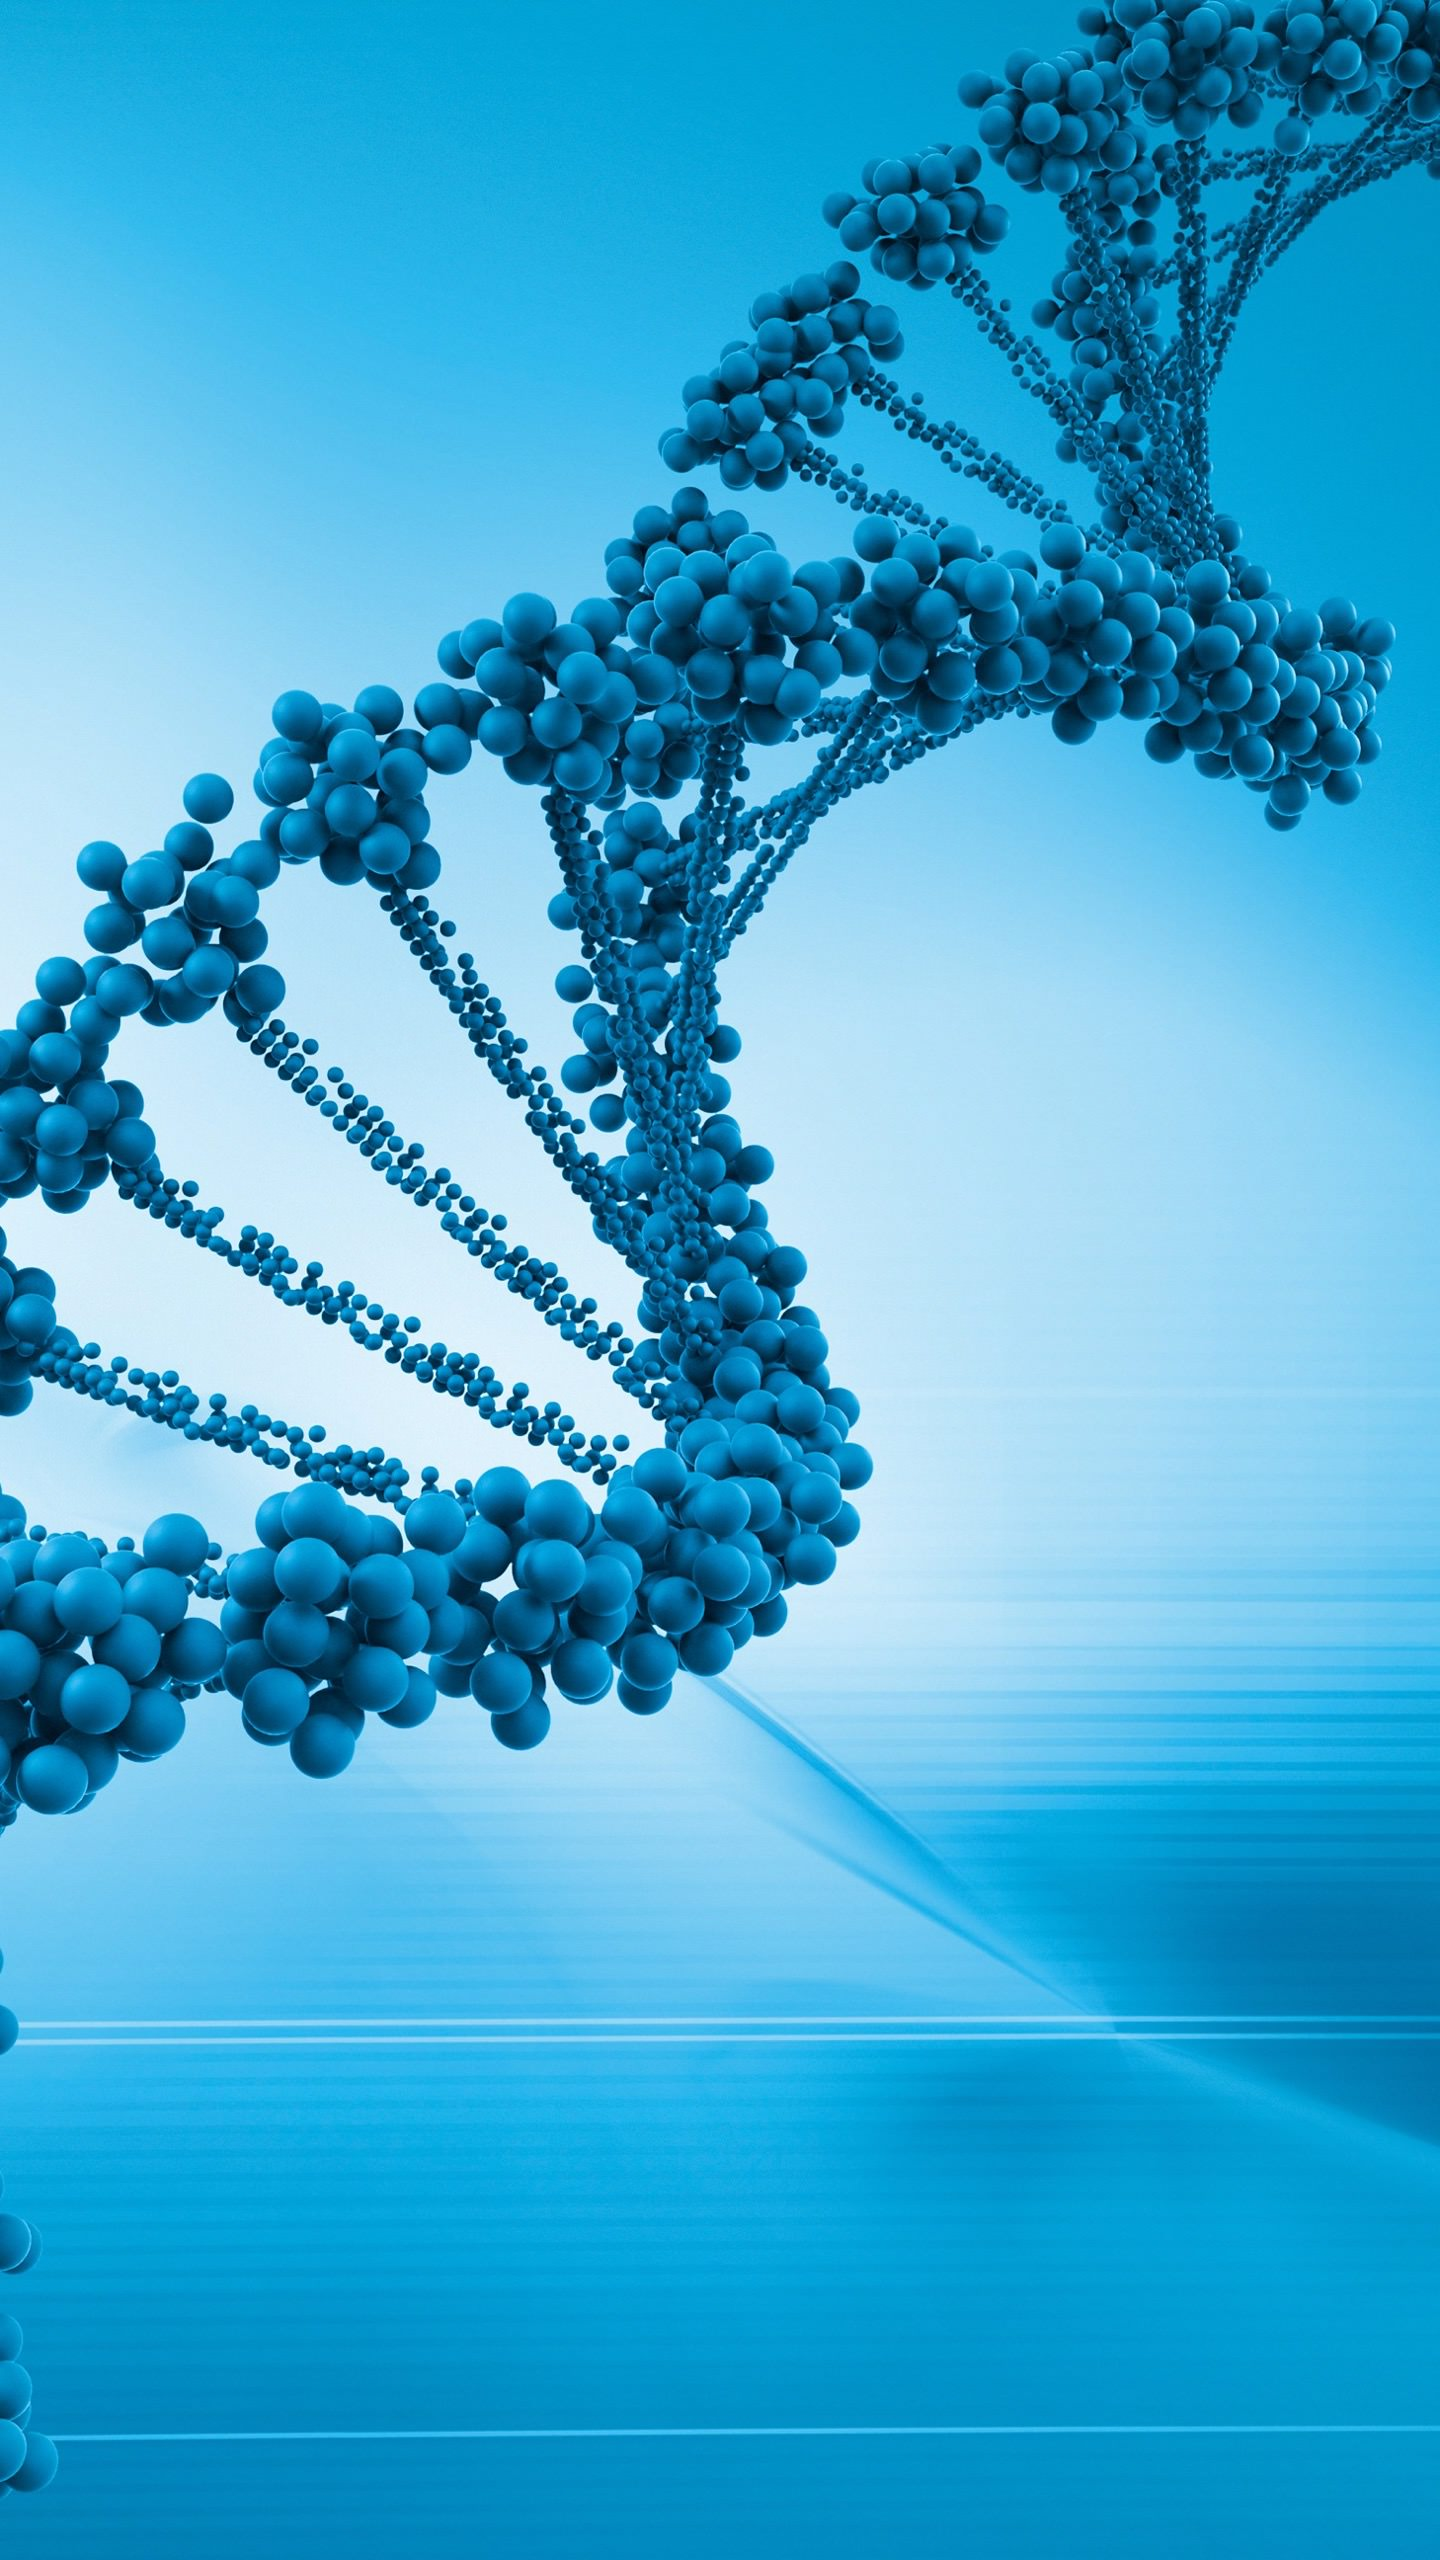 Cool DNA blue gene genome  wallpaper.sc SmartPhone